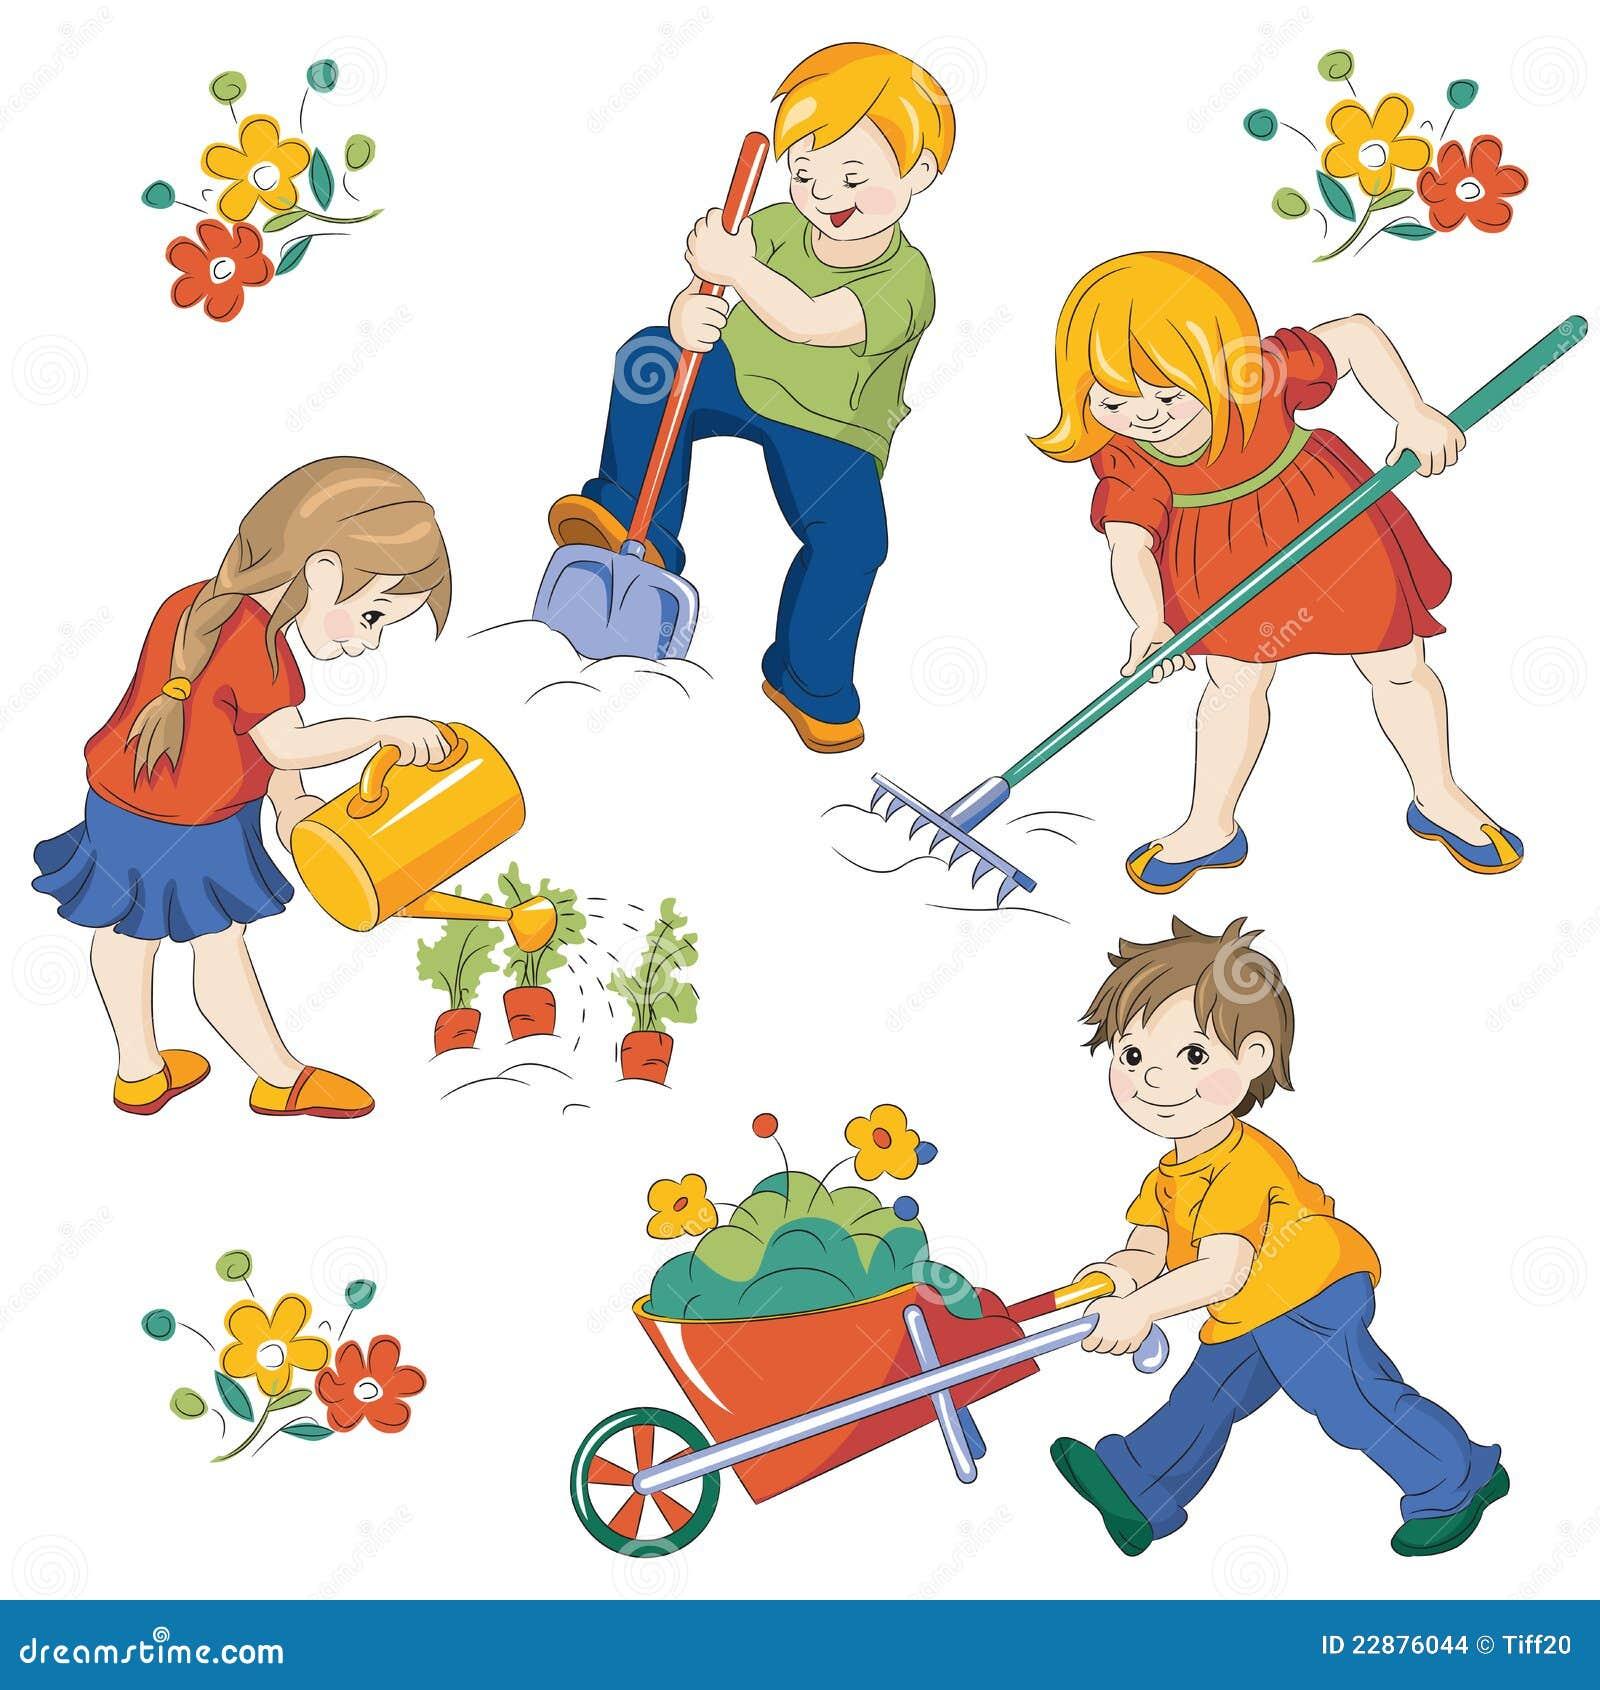 Vegetable garden stock vector. Illustration of people ...